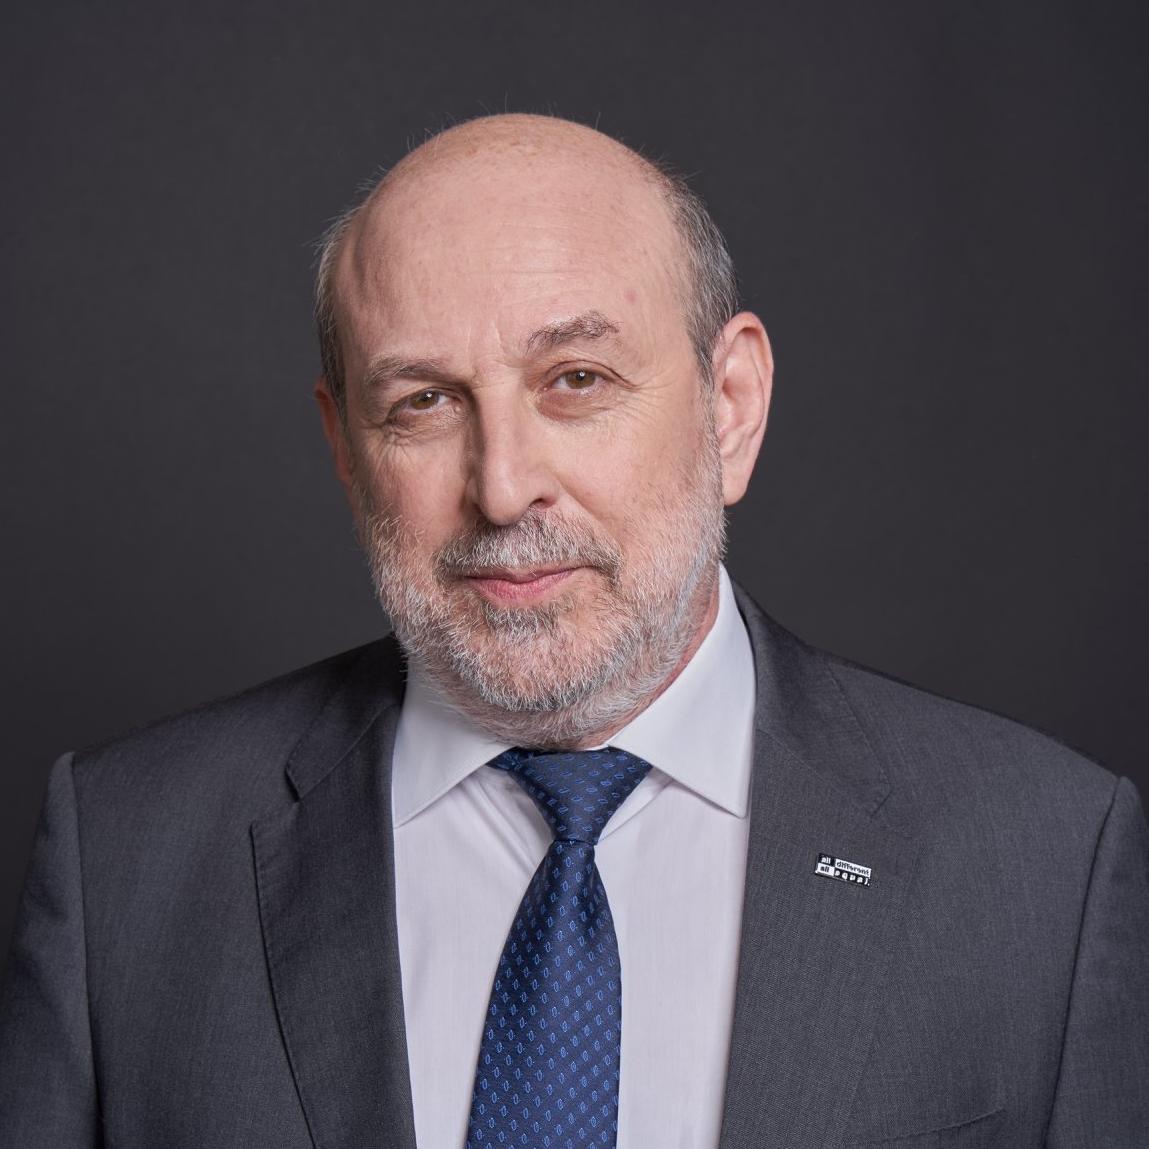 Депутат Сейма от «Согласия» Борис Цилевич избран главой Комитета по юридическим вопросам и правам человека ПАСЕ